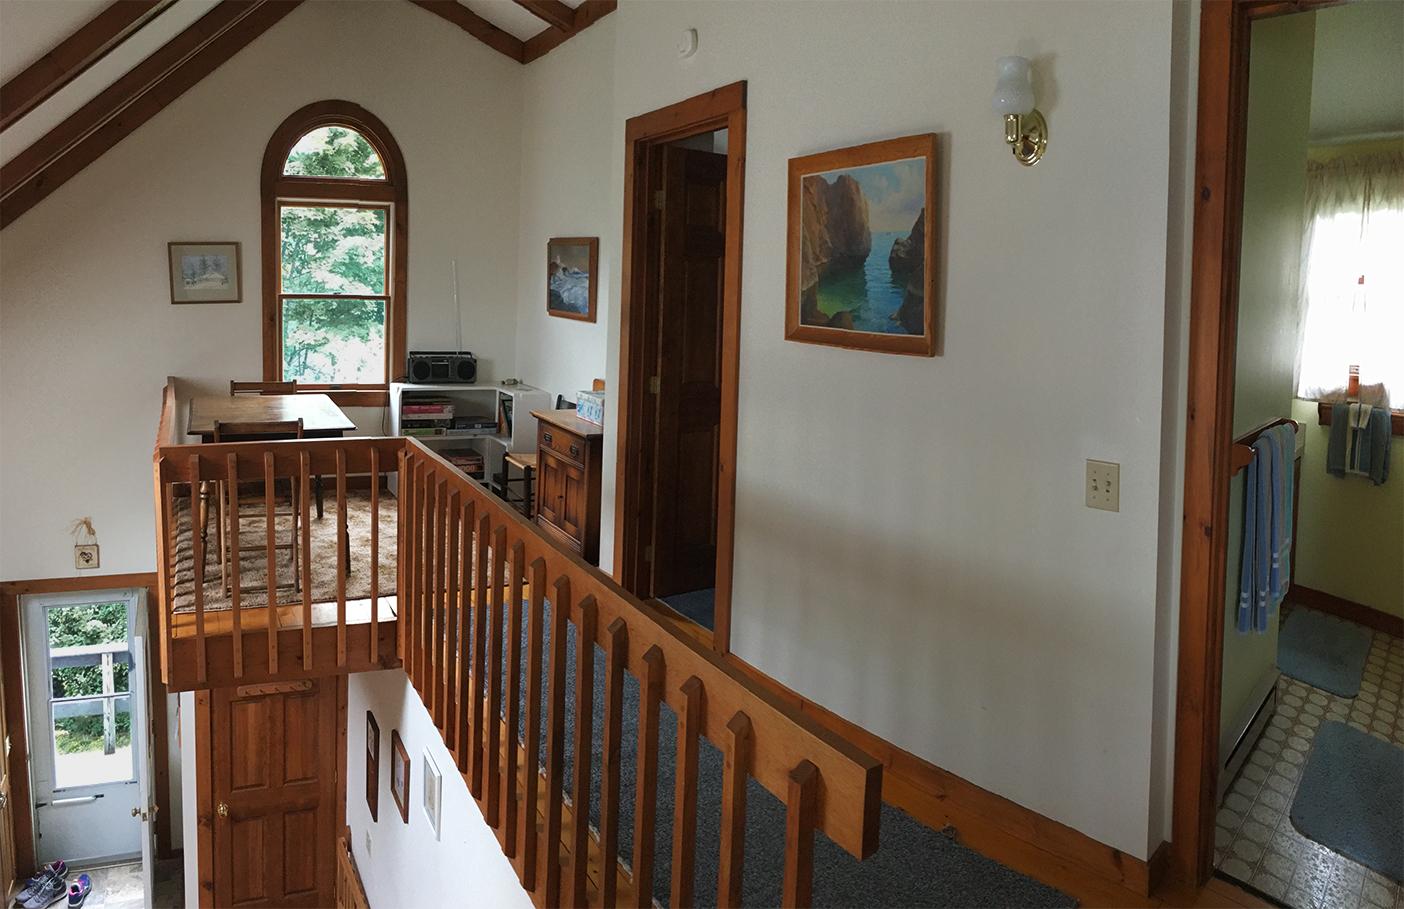 Second floor hallway and loft